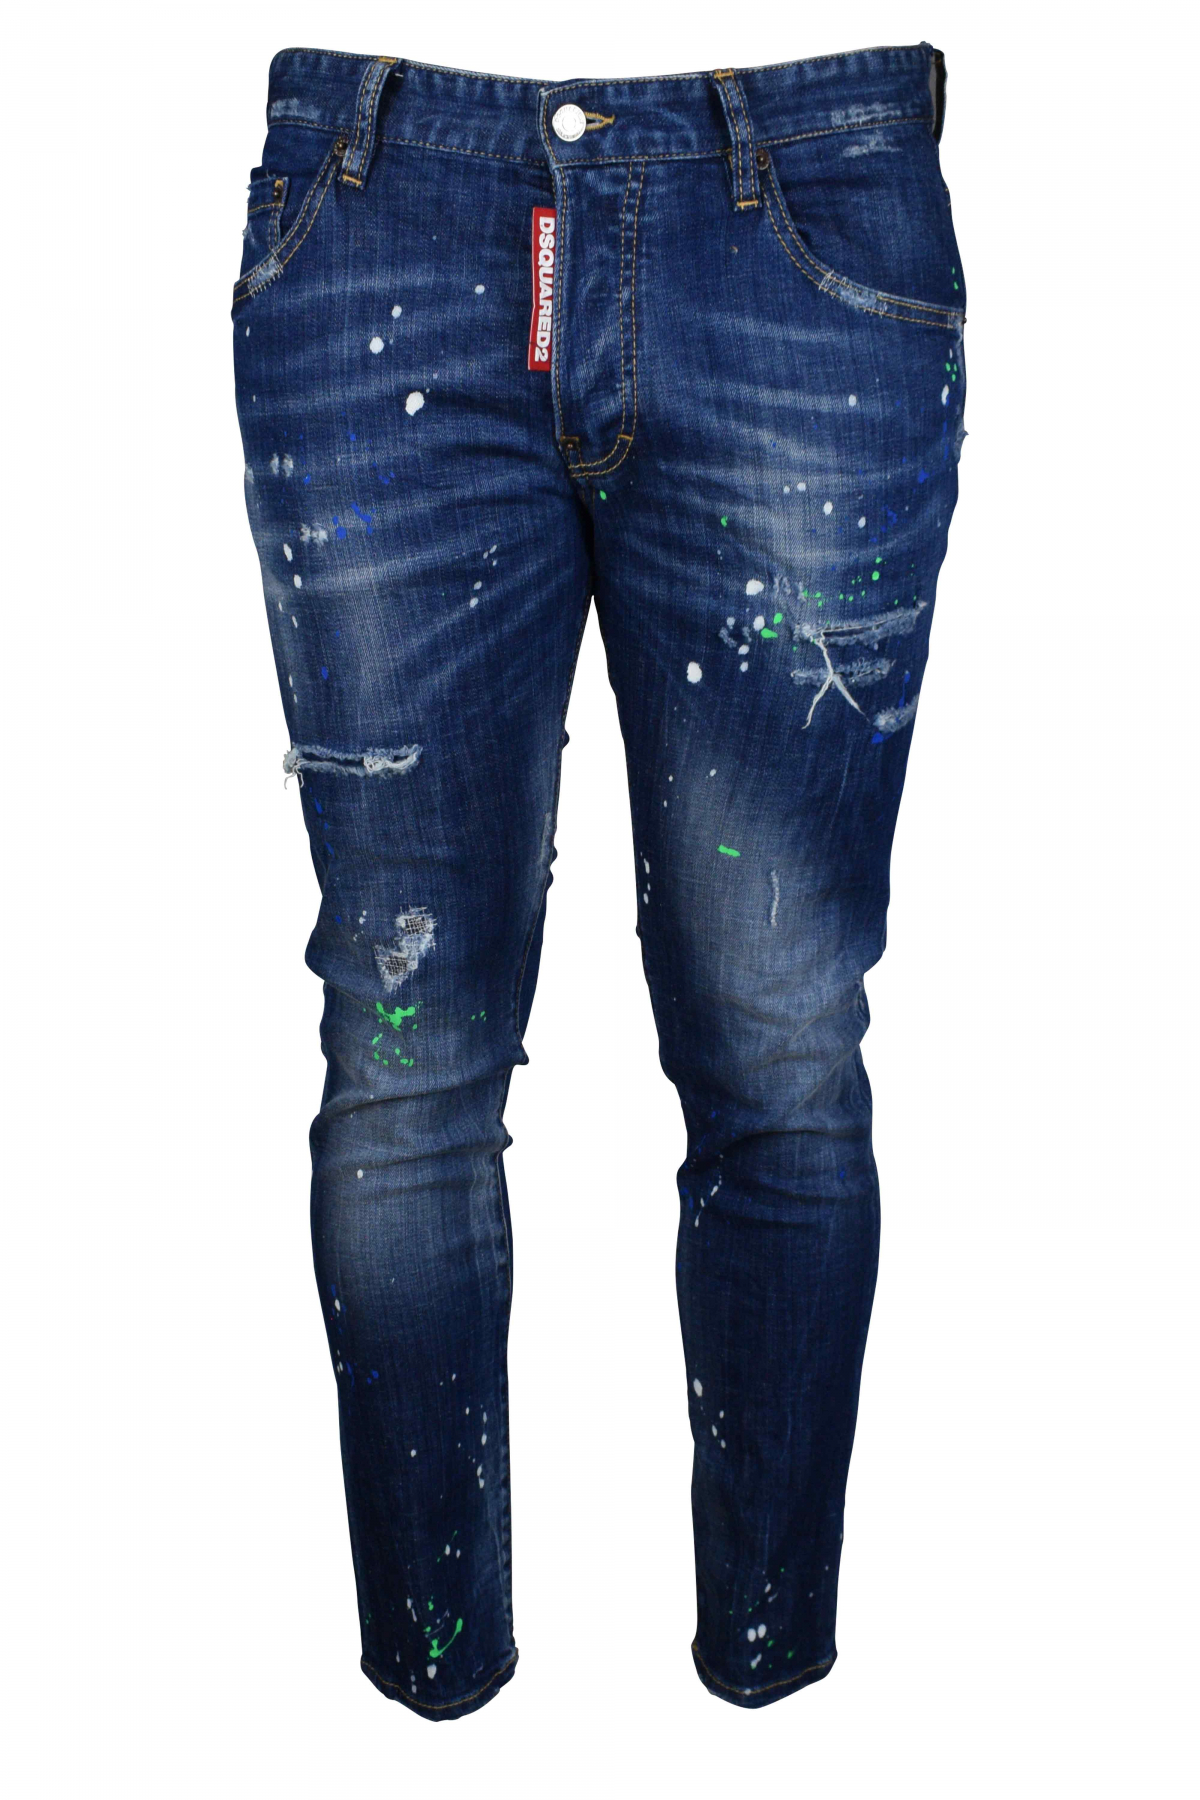 Skater Jean Dsquared2 blue.